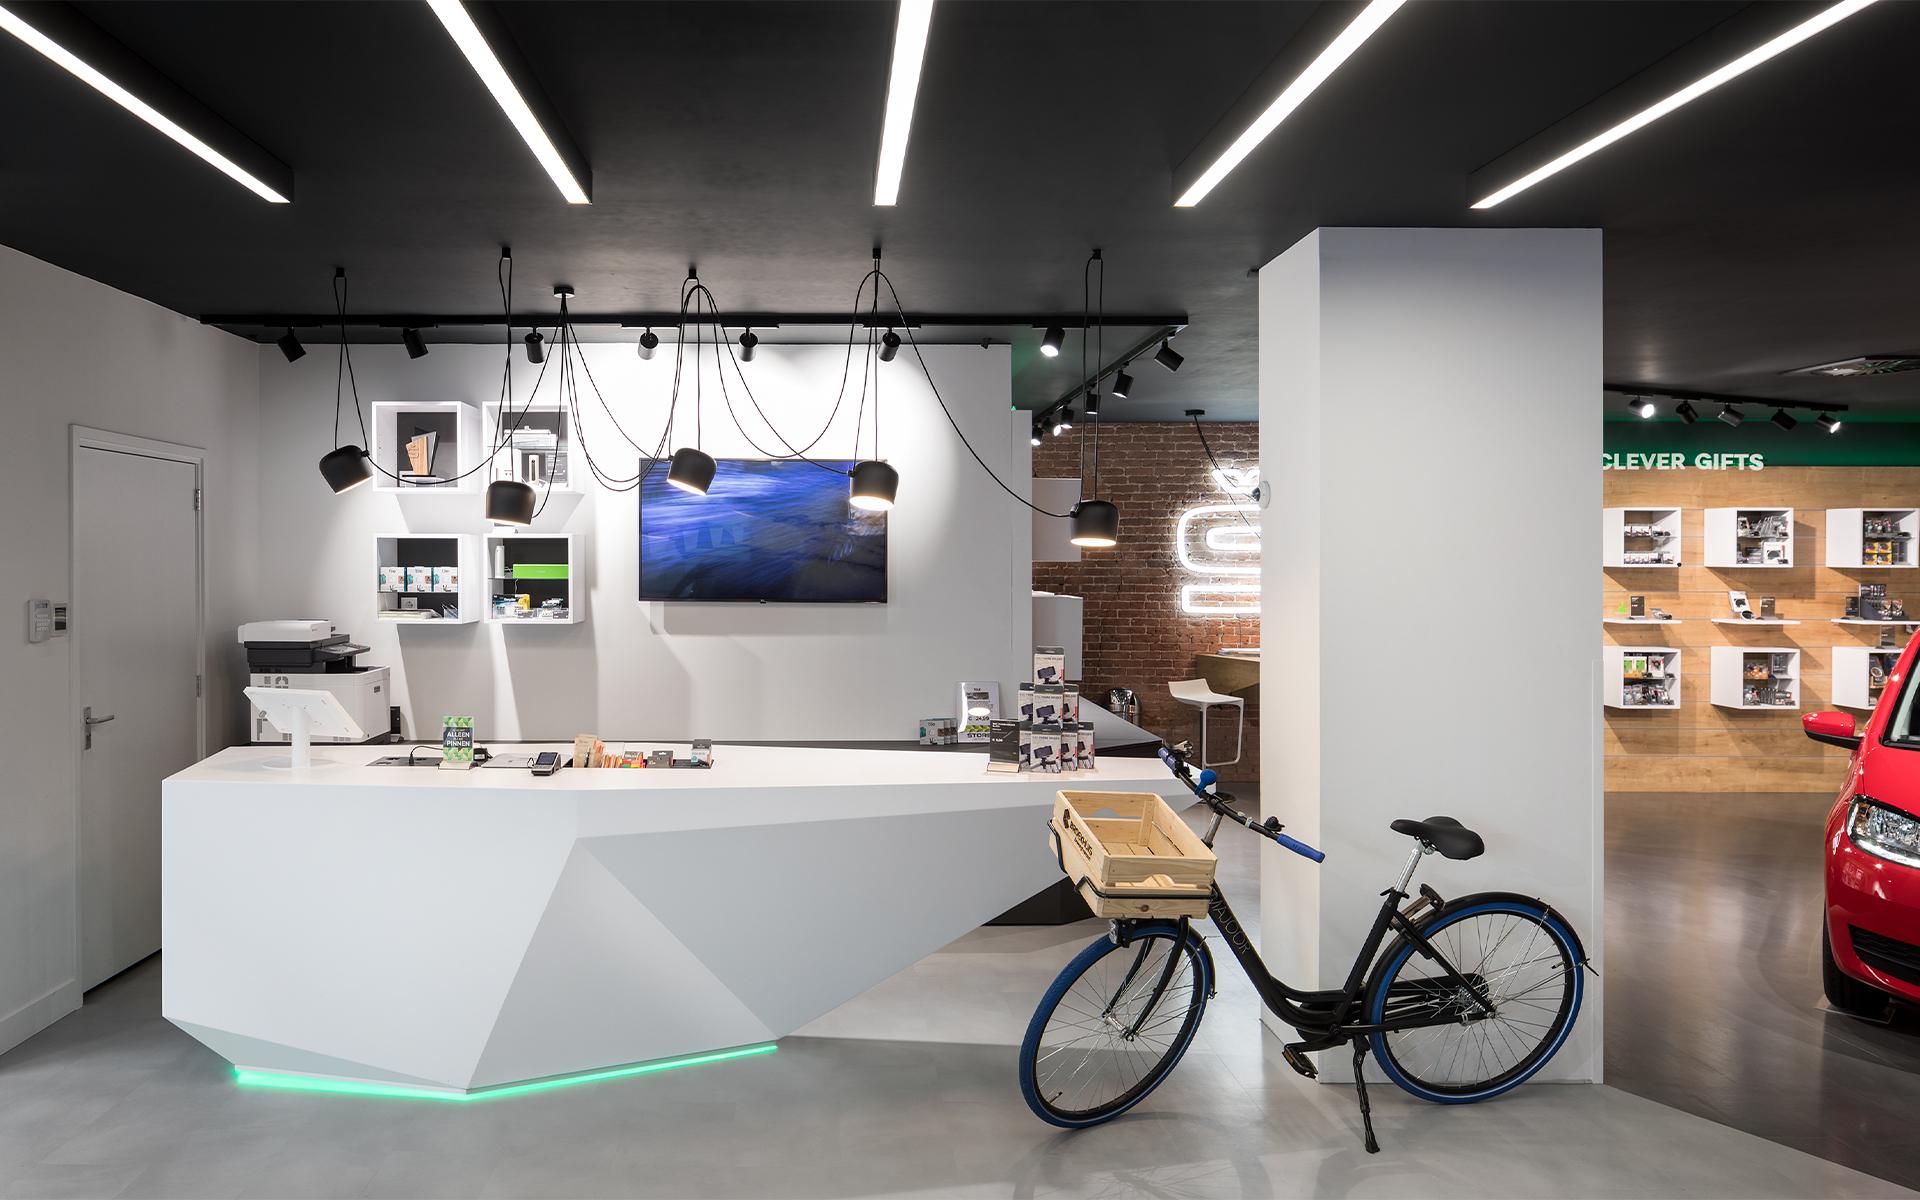 Skoda bike DAY Creative Spatial & Interior Design / Brand Design